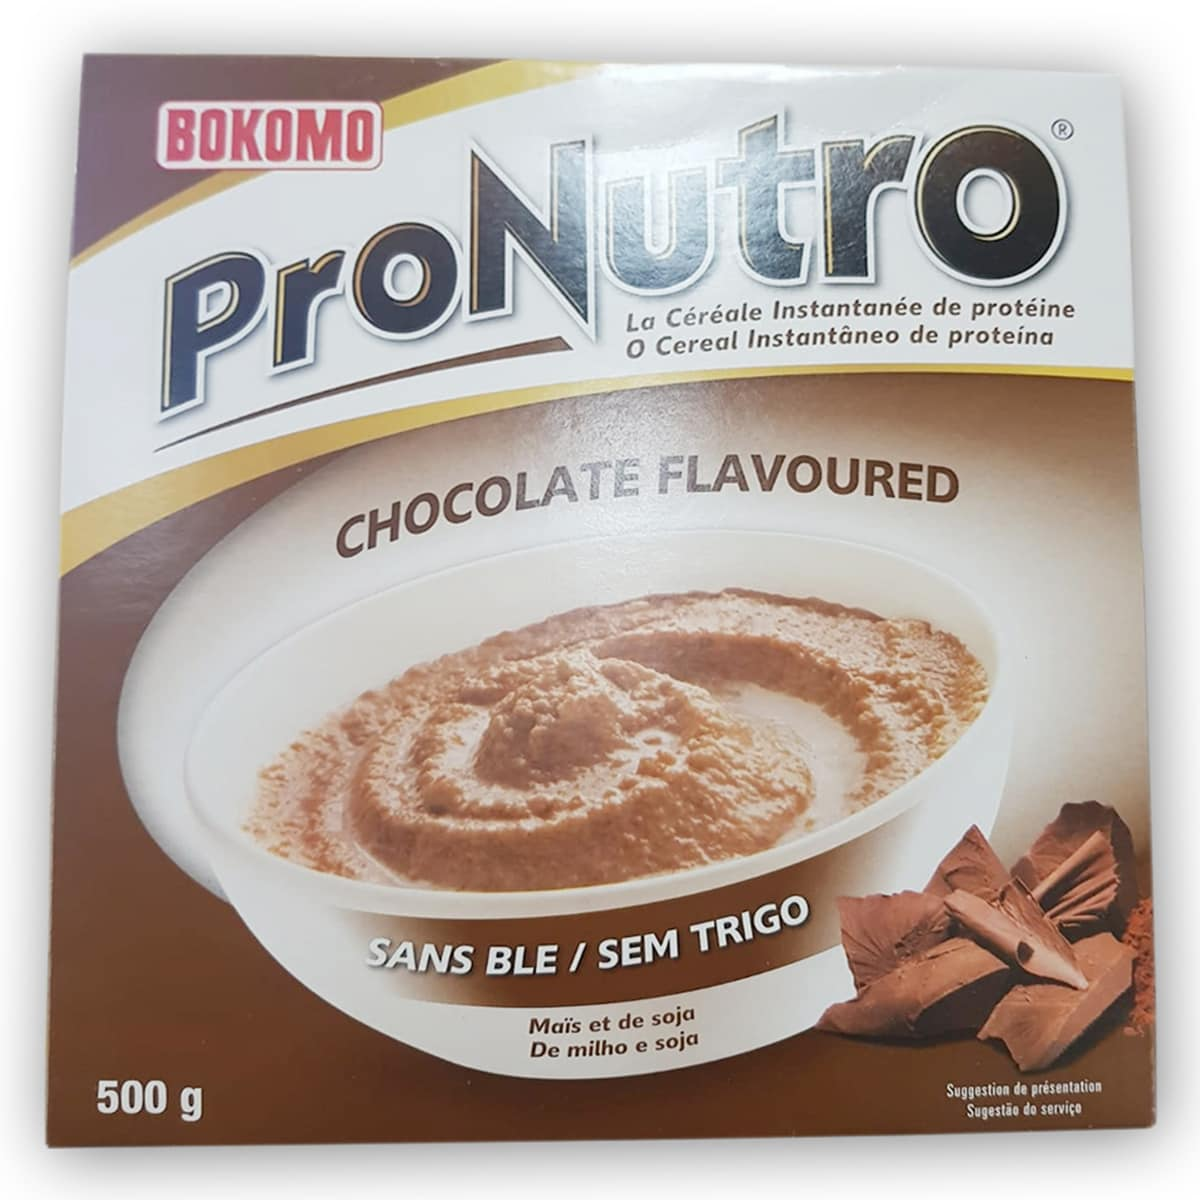 Buy Bokomo Pronutro Chocolate (Wheat-free) - 500 gm